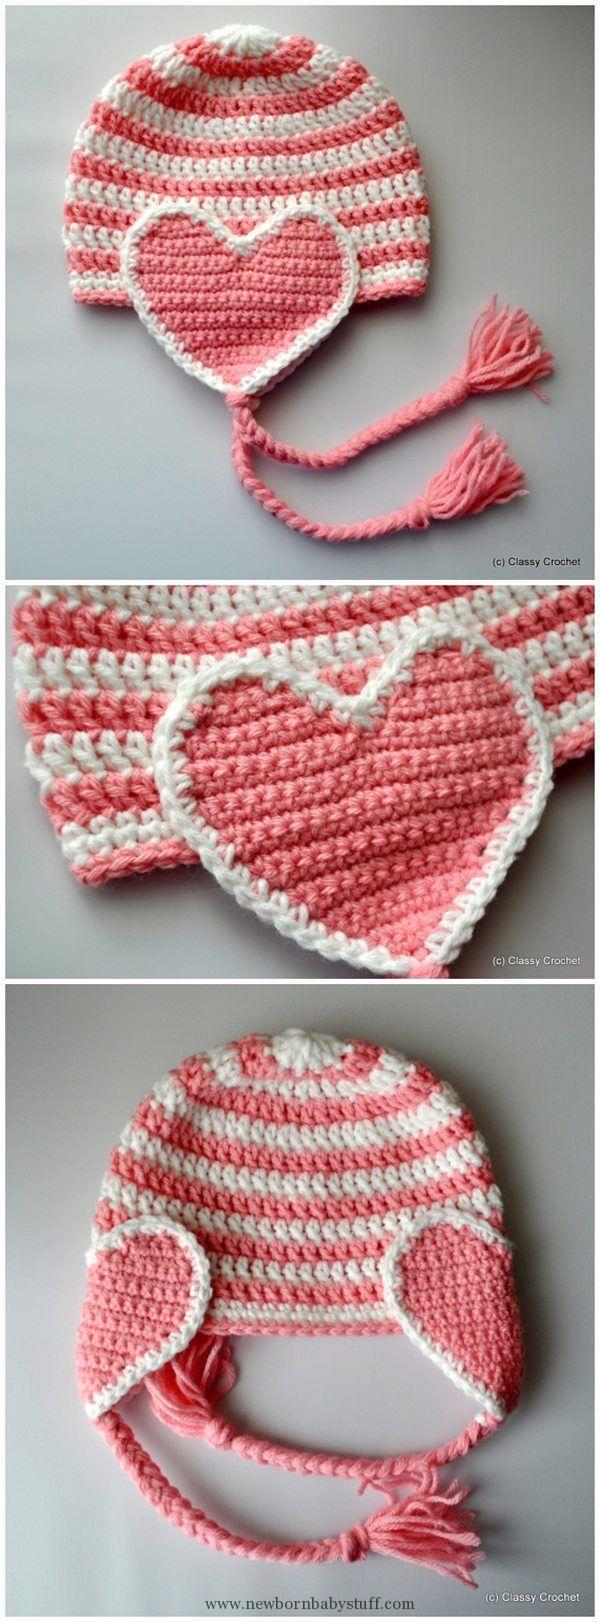 Baby Knitting Patterns Crochet Valentine Heart Earflap Hat ...